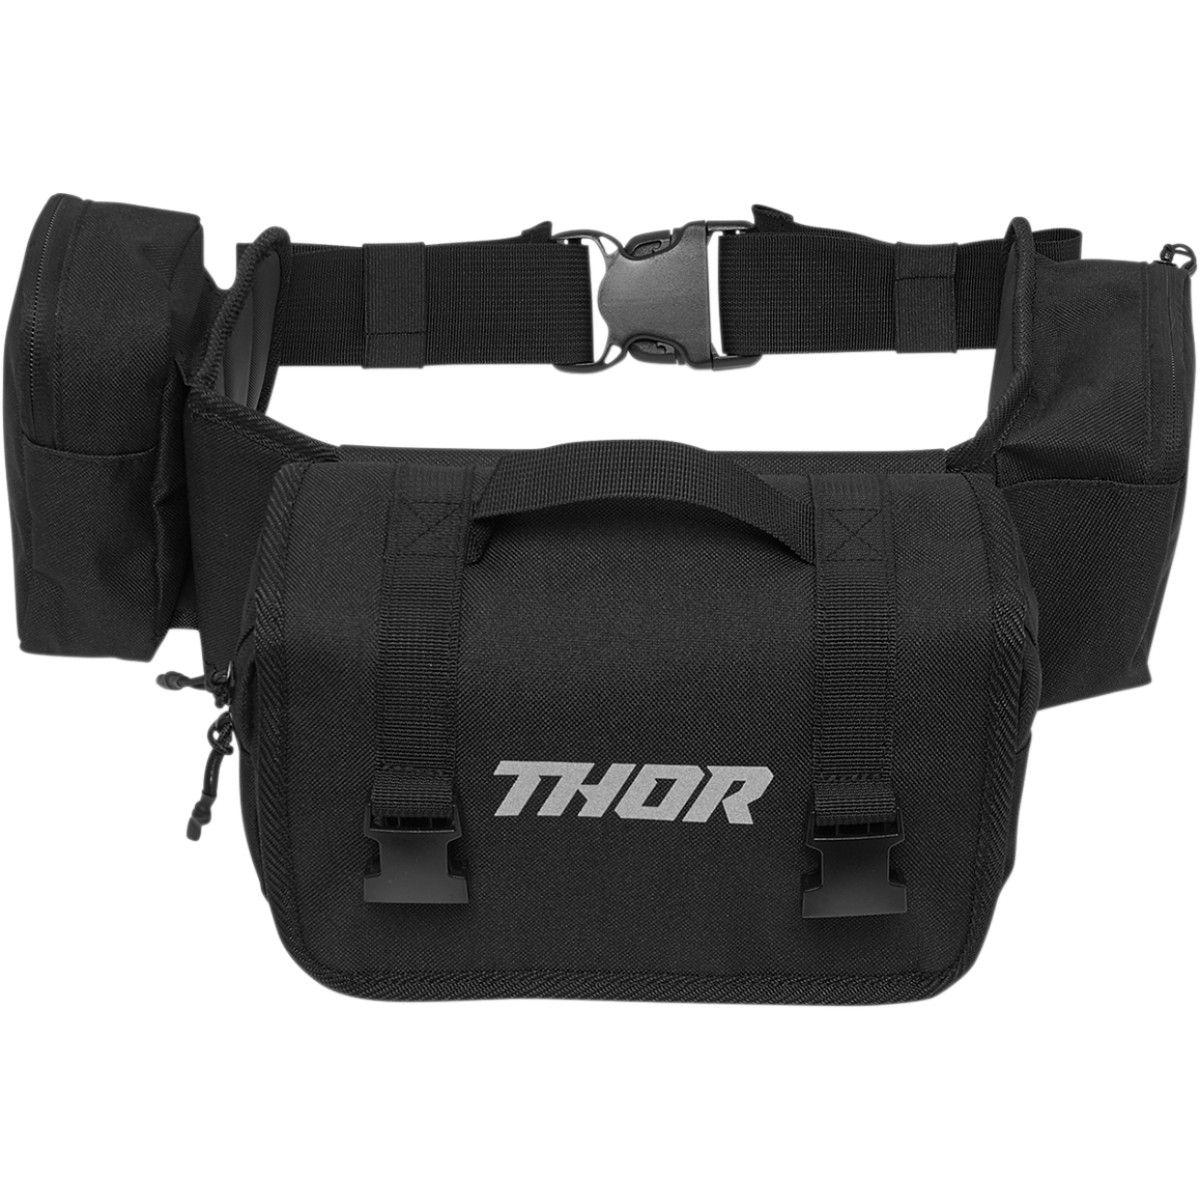 Thor Tech Vault Pack Heuptas Enduro